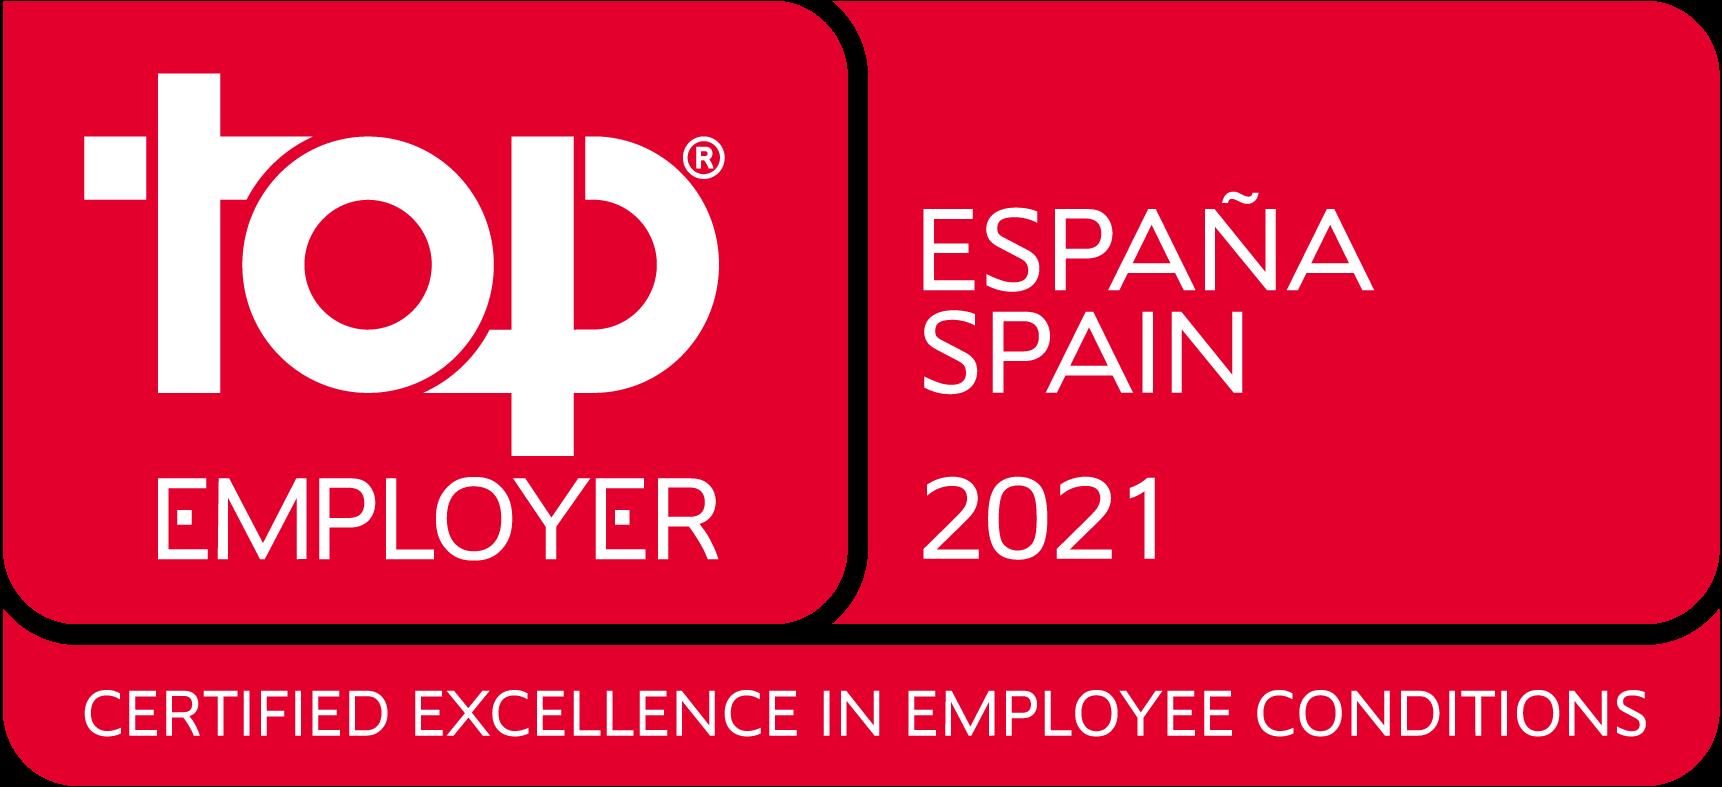 Top Employer Spain